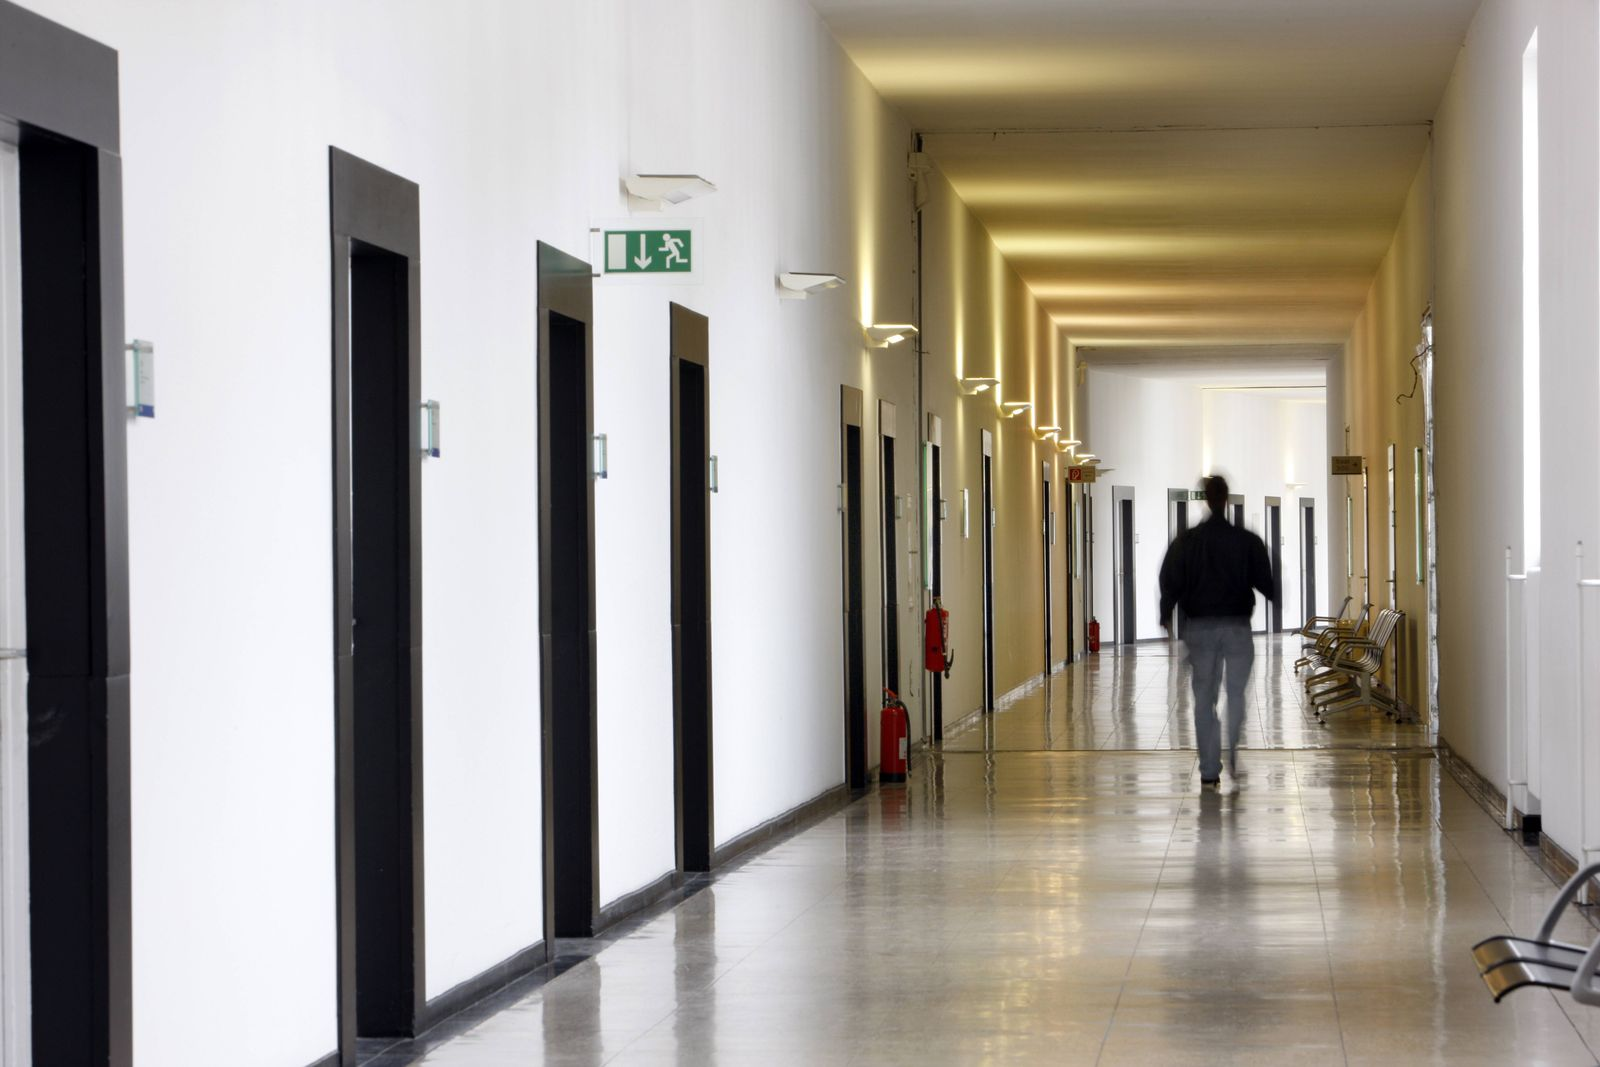 EINMALIGE VERWENDUNG Korridor/ Institution/ Gang/ Flur/ Behörde